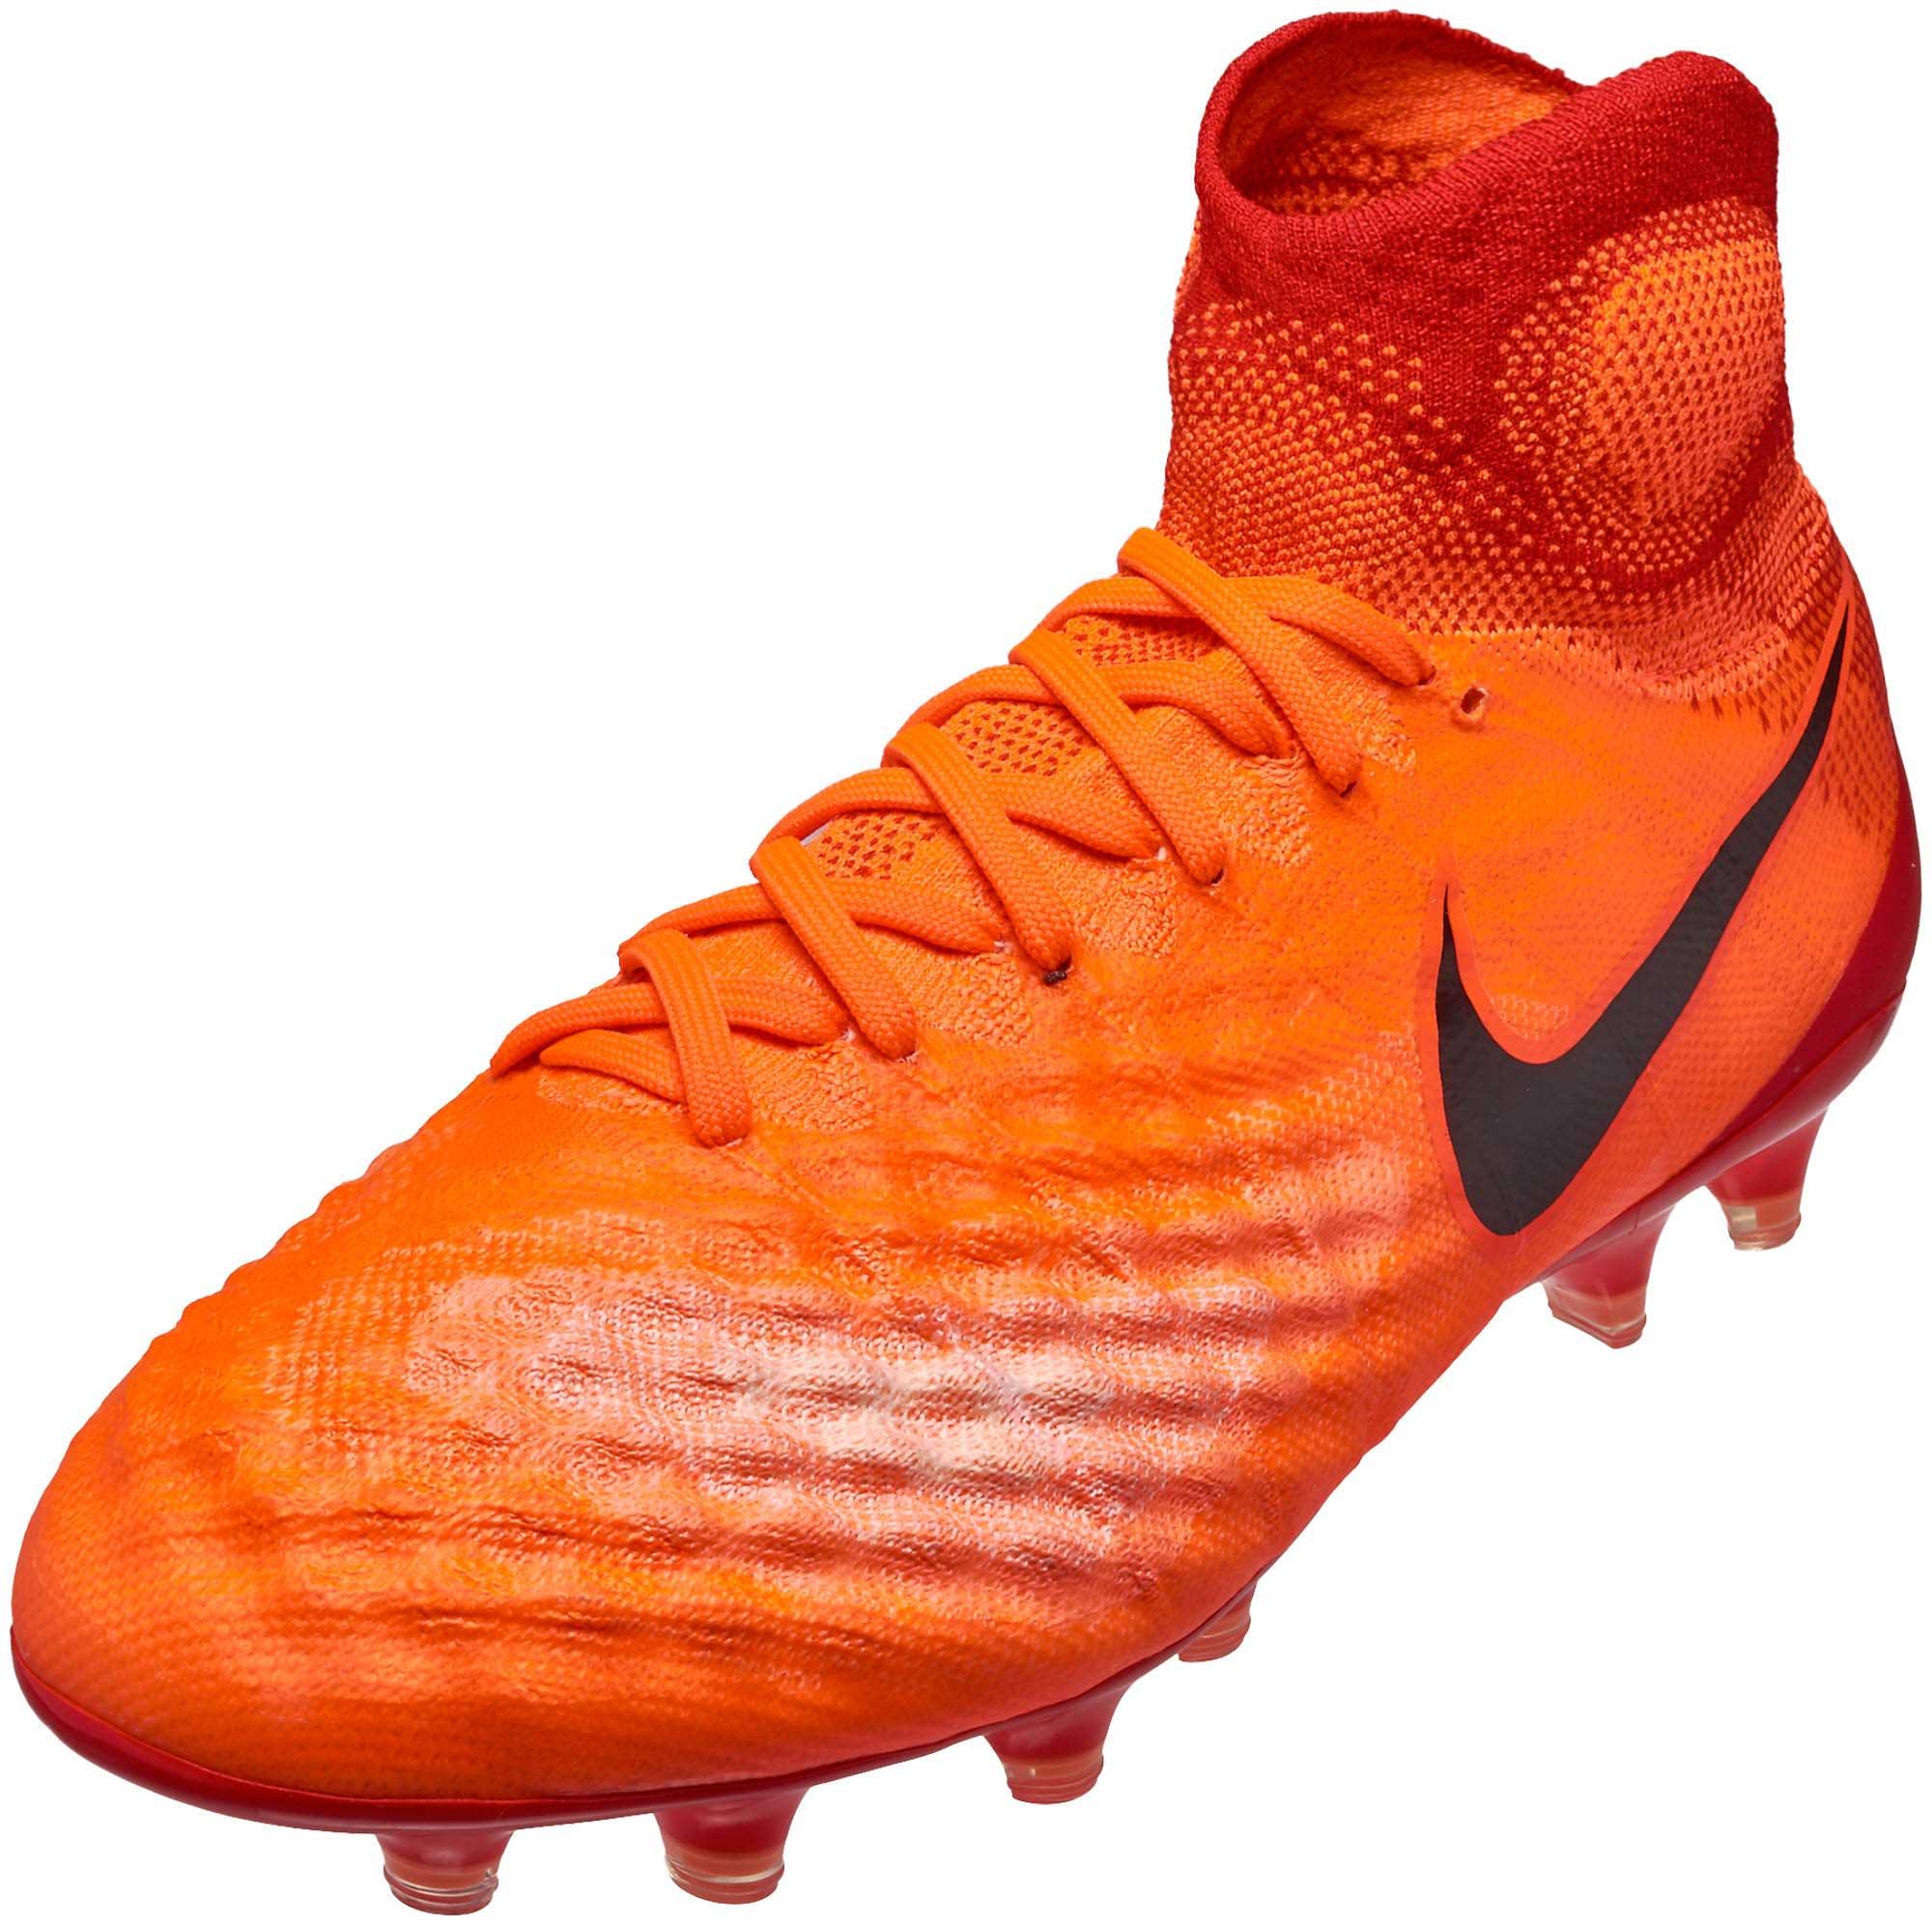 watch 61899 ce593 Nike Magista Obra II FG Soccer Cleats – Total Crimson  University Red